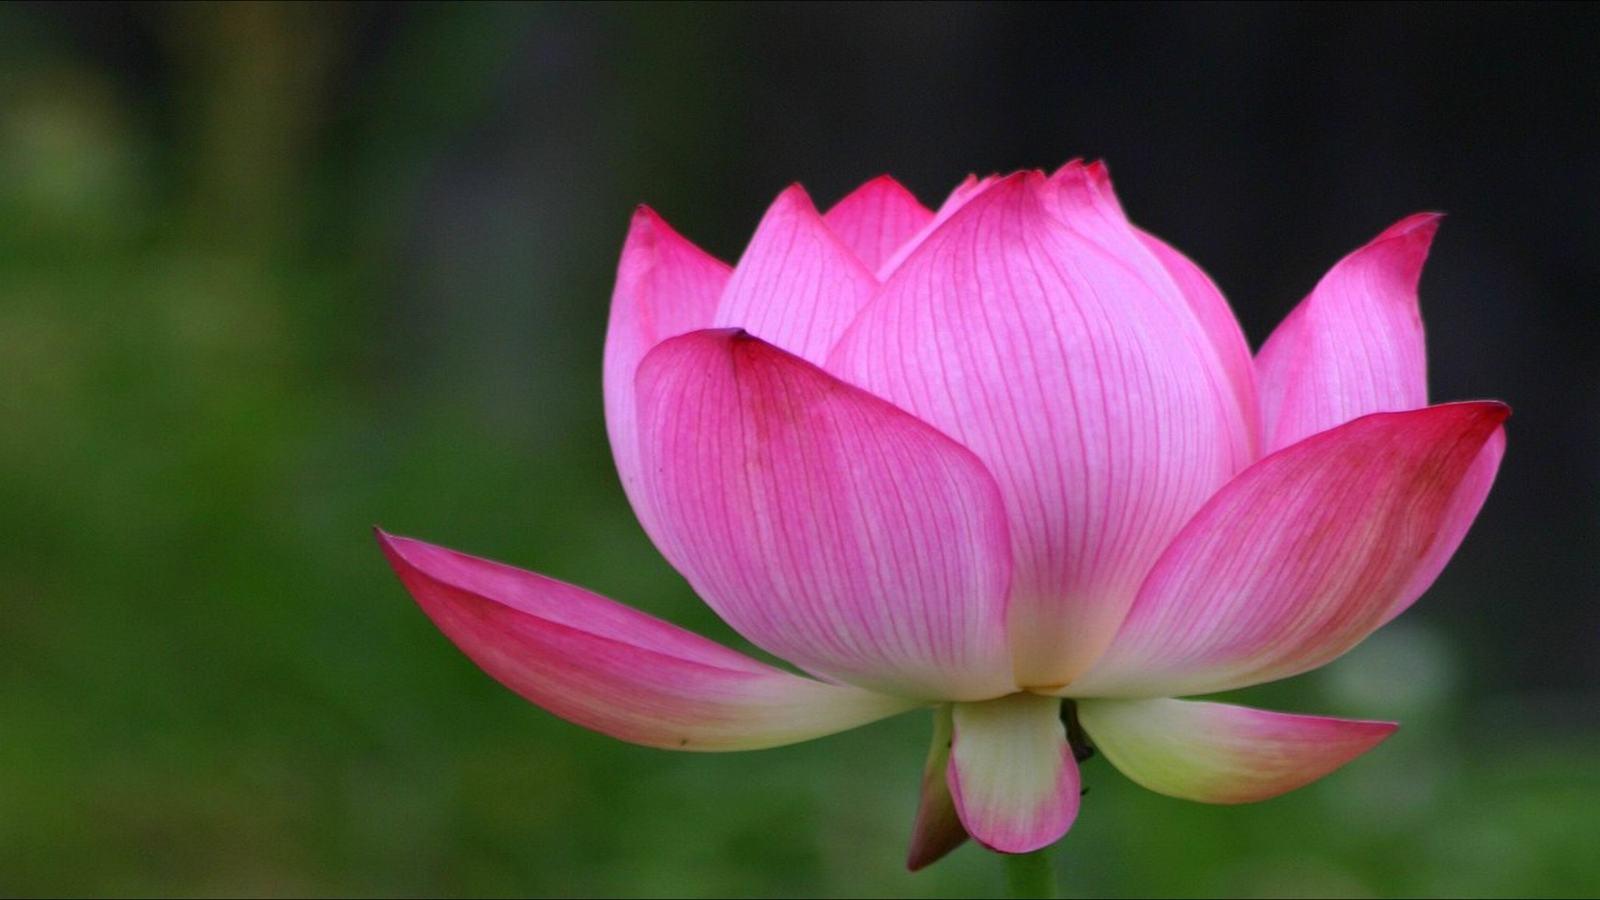 ảnh hoa sen tuyệt đẹp